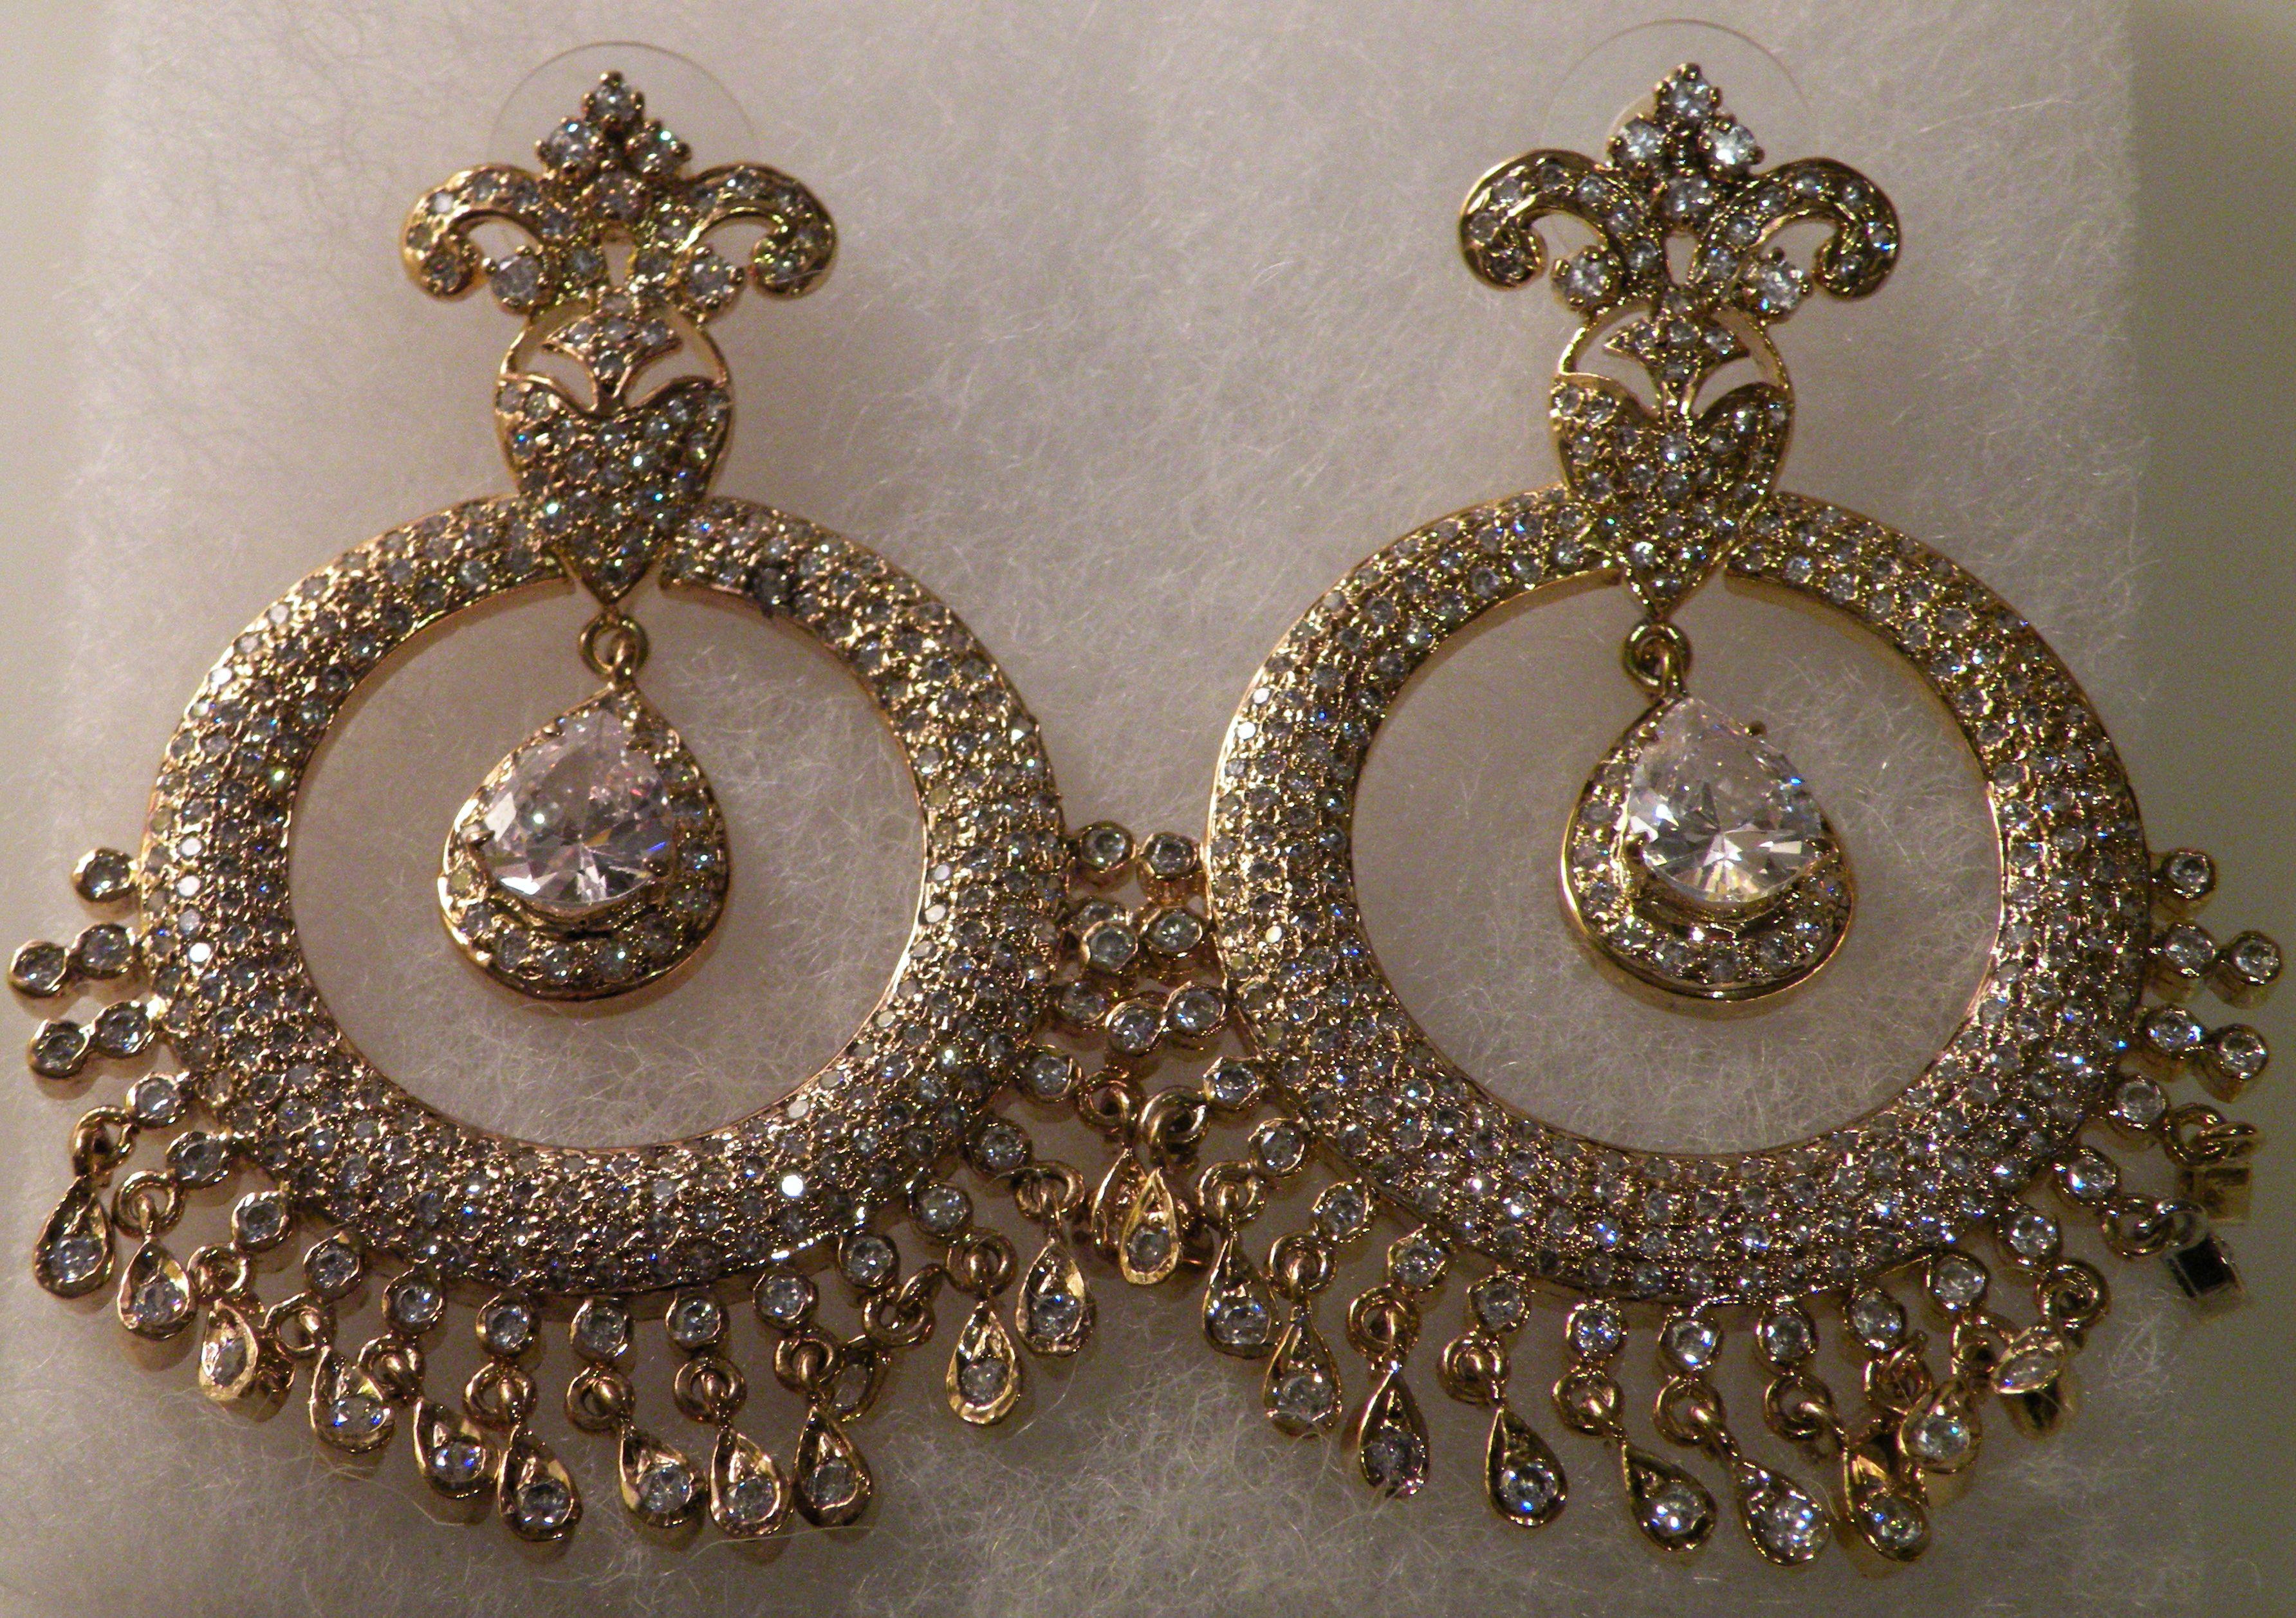 Big bridal chandelier earrings musethecollective big bridal chandelier earrings musethecollective arubaitofo Choice Image